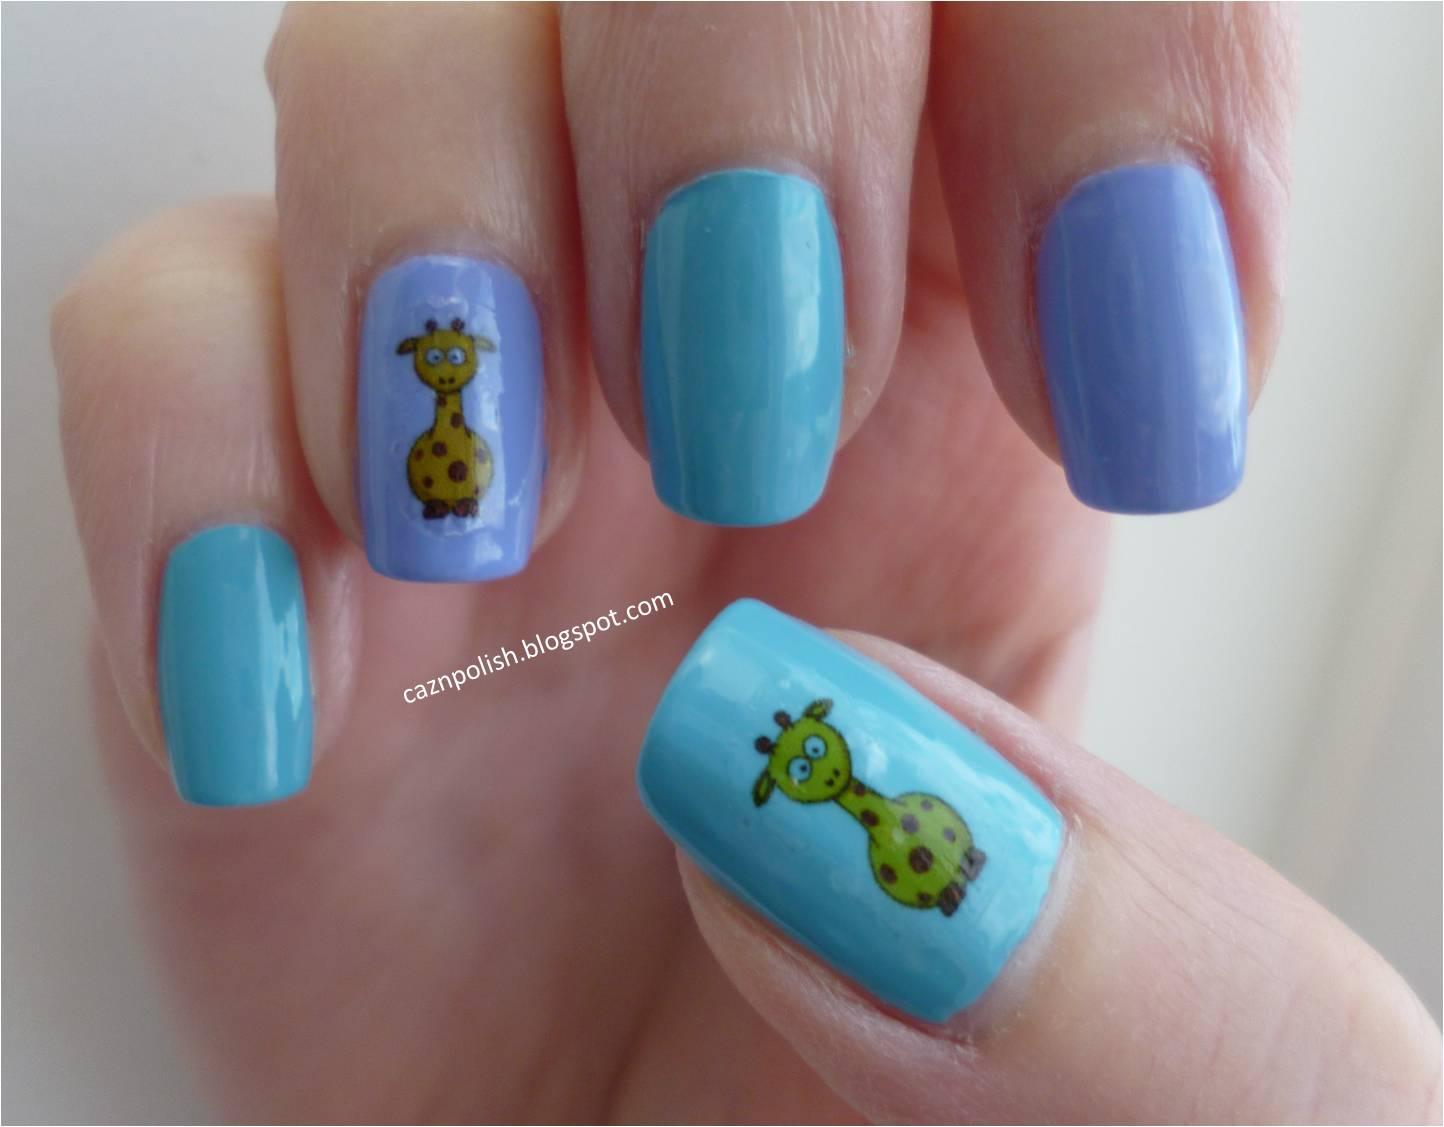 caz 'n' polish | Giraffe Nail Transfers